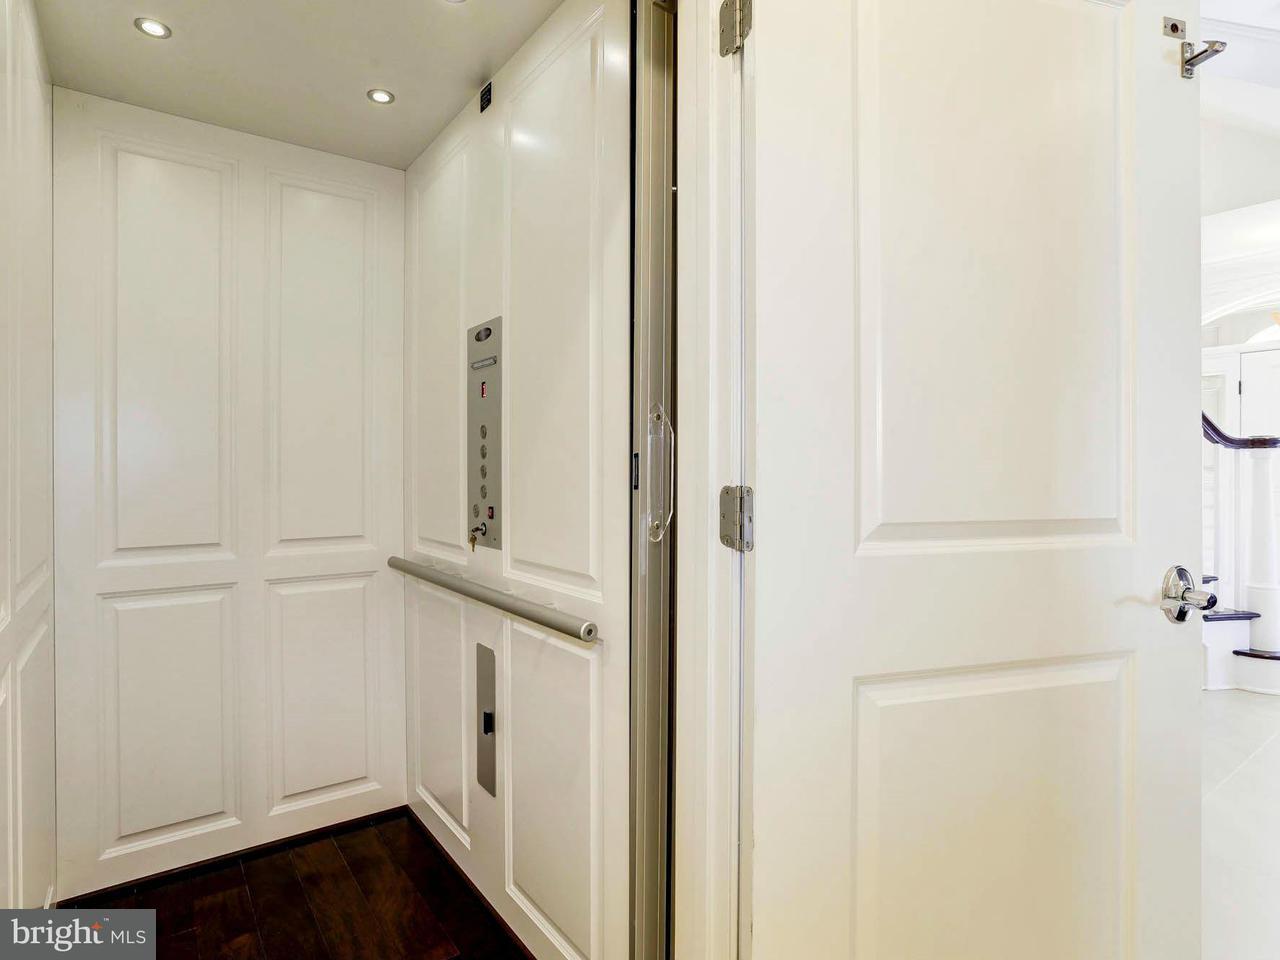 Additional photo for property listing at 10827 SYMPHONY PARK Drive 10827 SYMPHONY PARK Drive North Bethesda, Maryland 20852 États-Unis